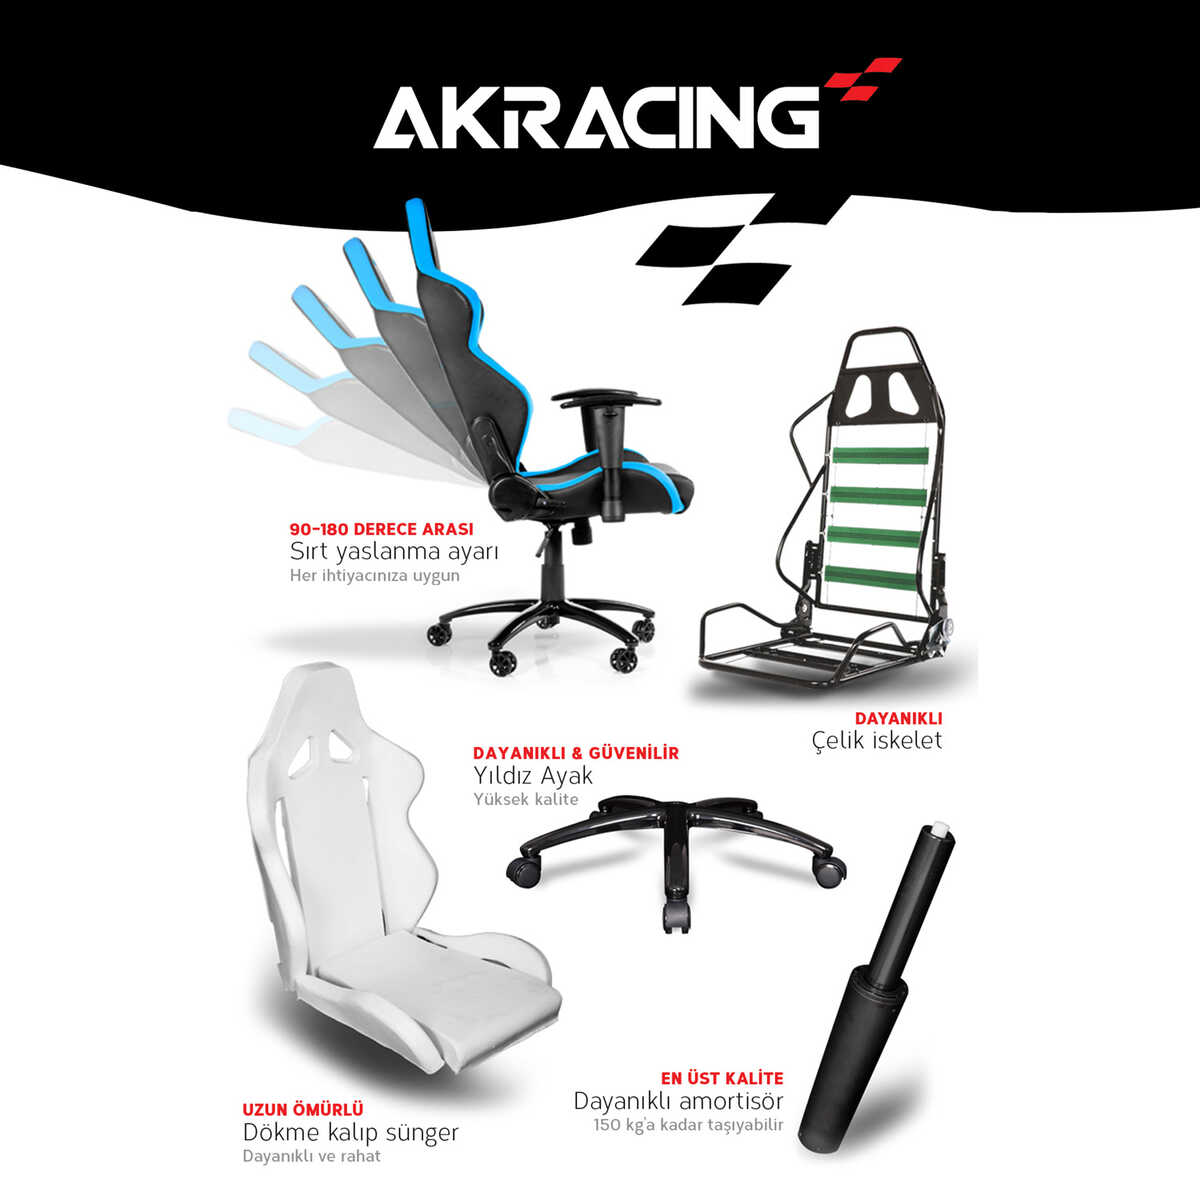 AKRacing Player Seri Profesyonel PC Oyuncu ve Yönetici Koltuğu - Kırmızı-Siyah